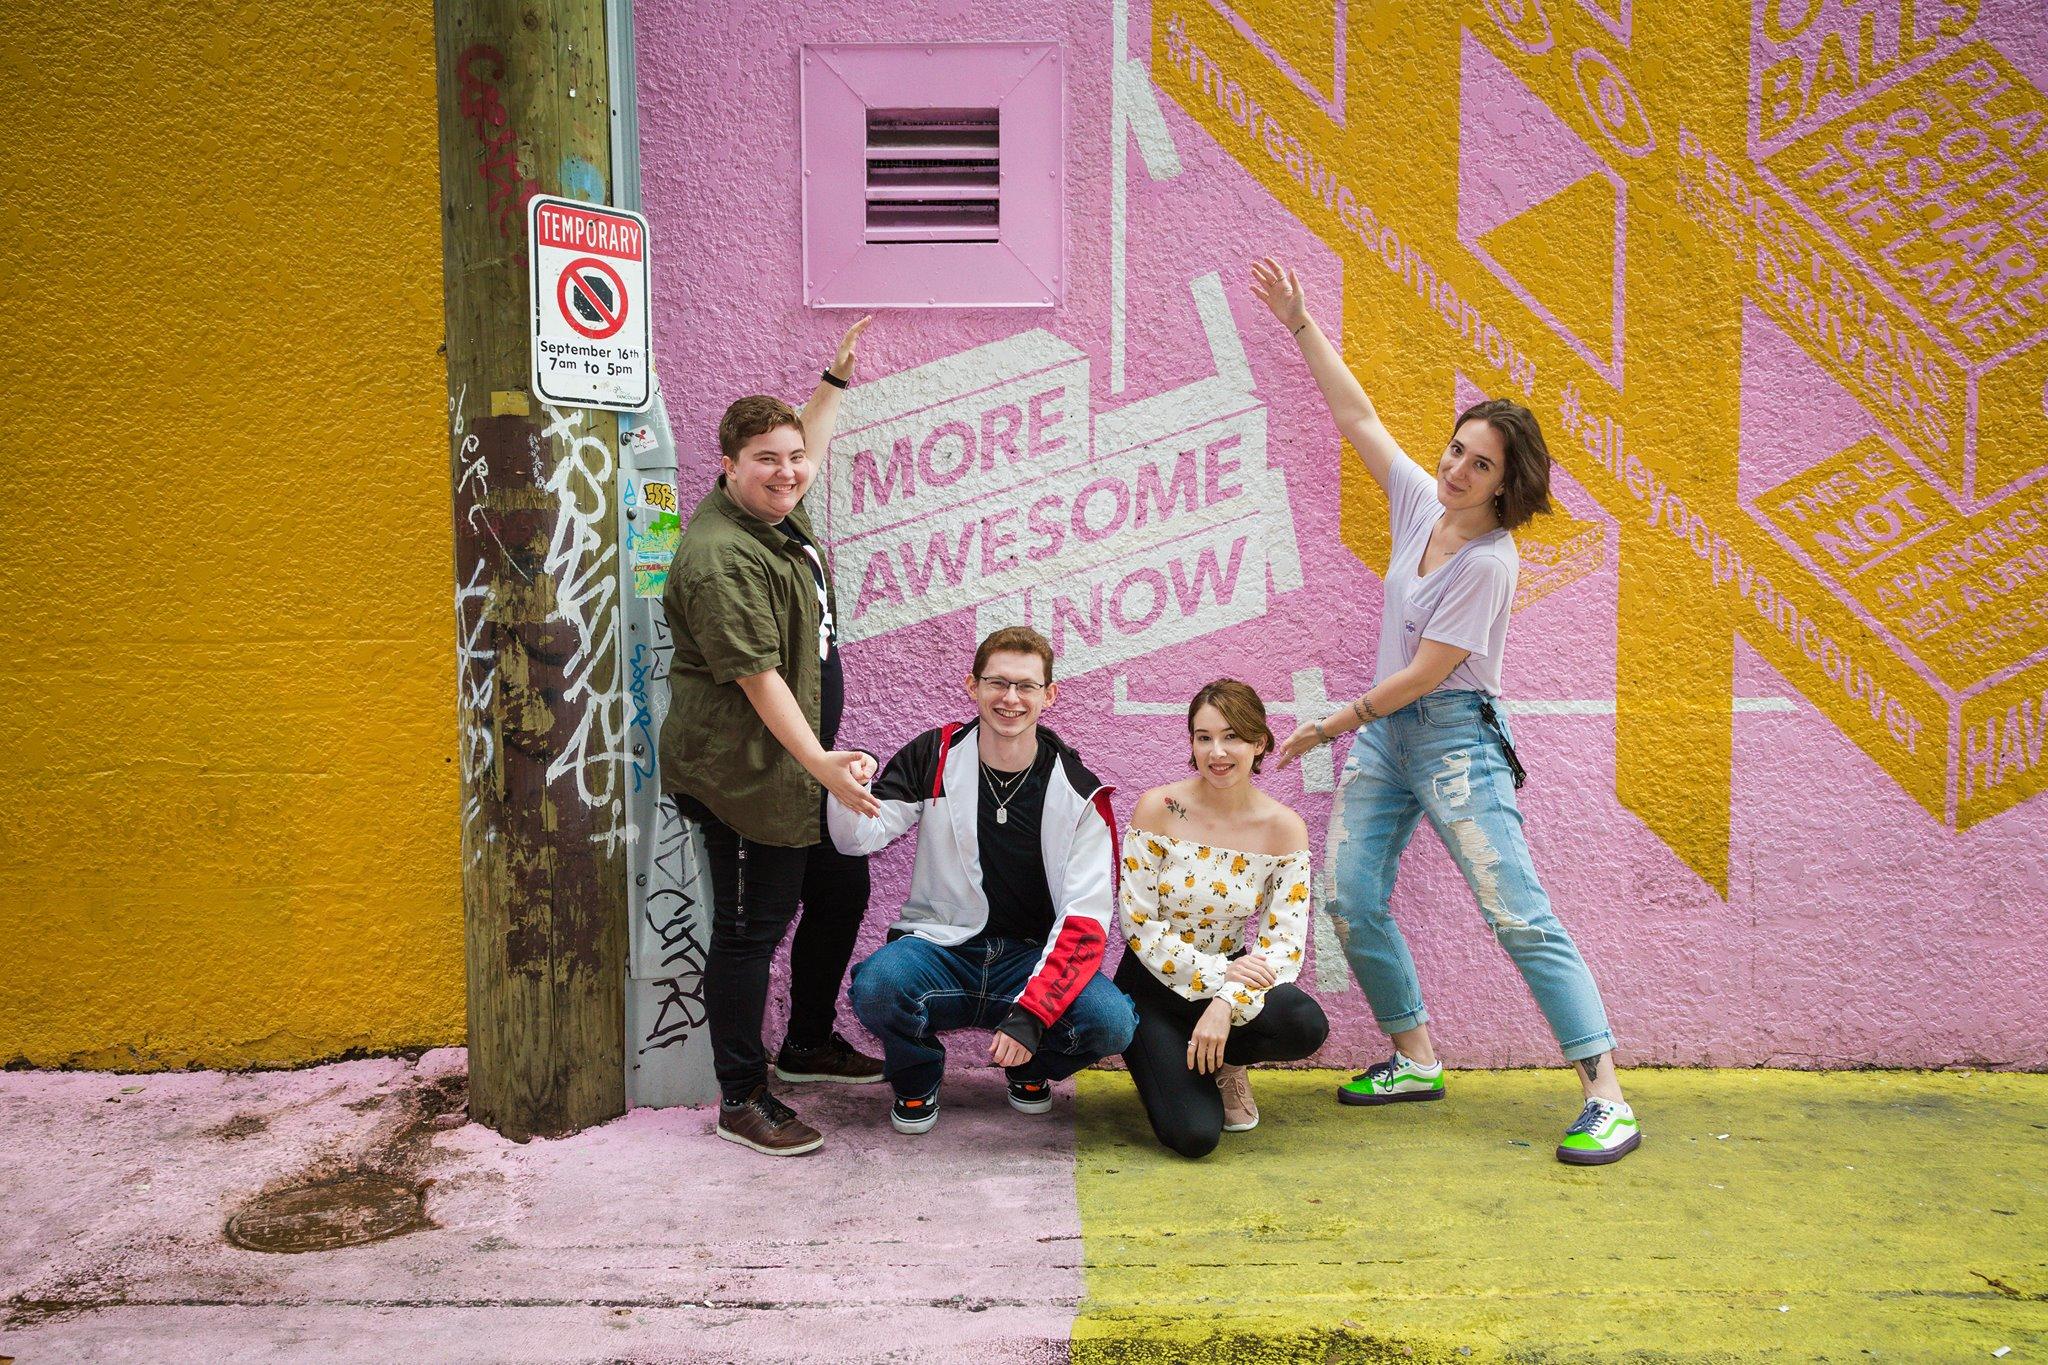 From Left to Right, Alex Sharp (me),  Shawn Hodgson ,  Gabriela Barcelo , and  Bianca Poroliseanu